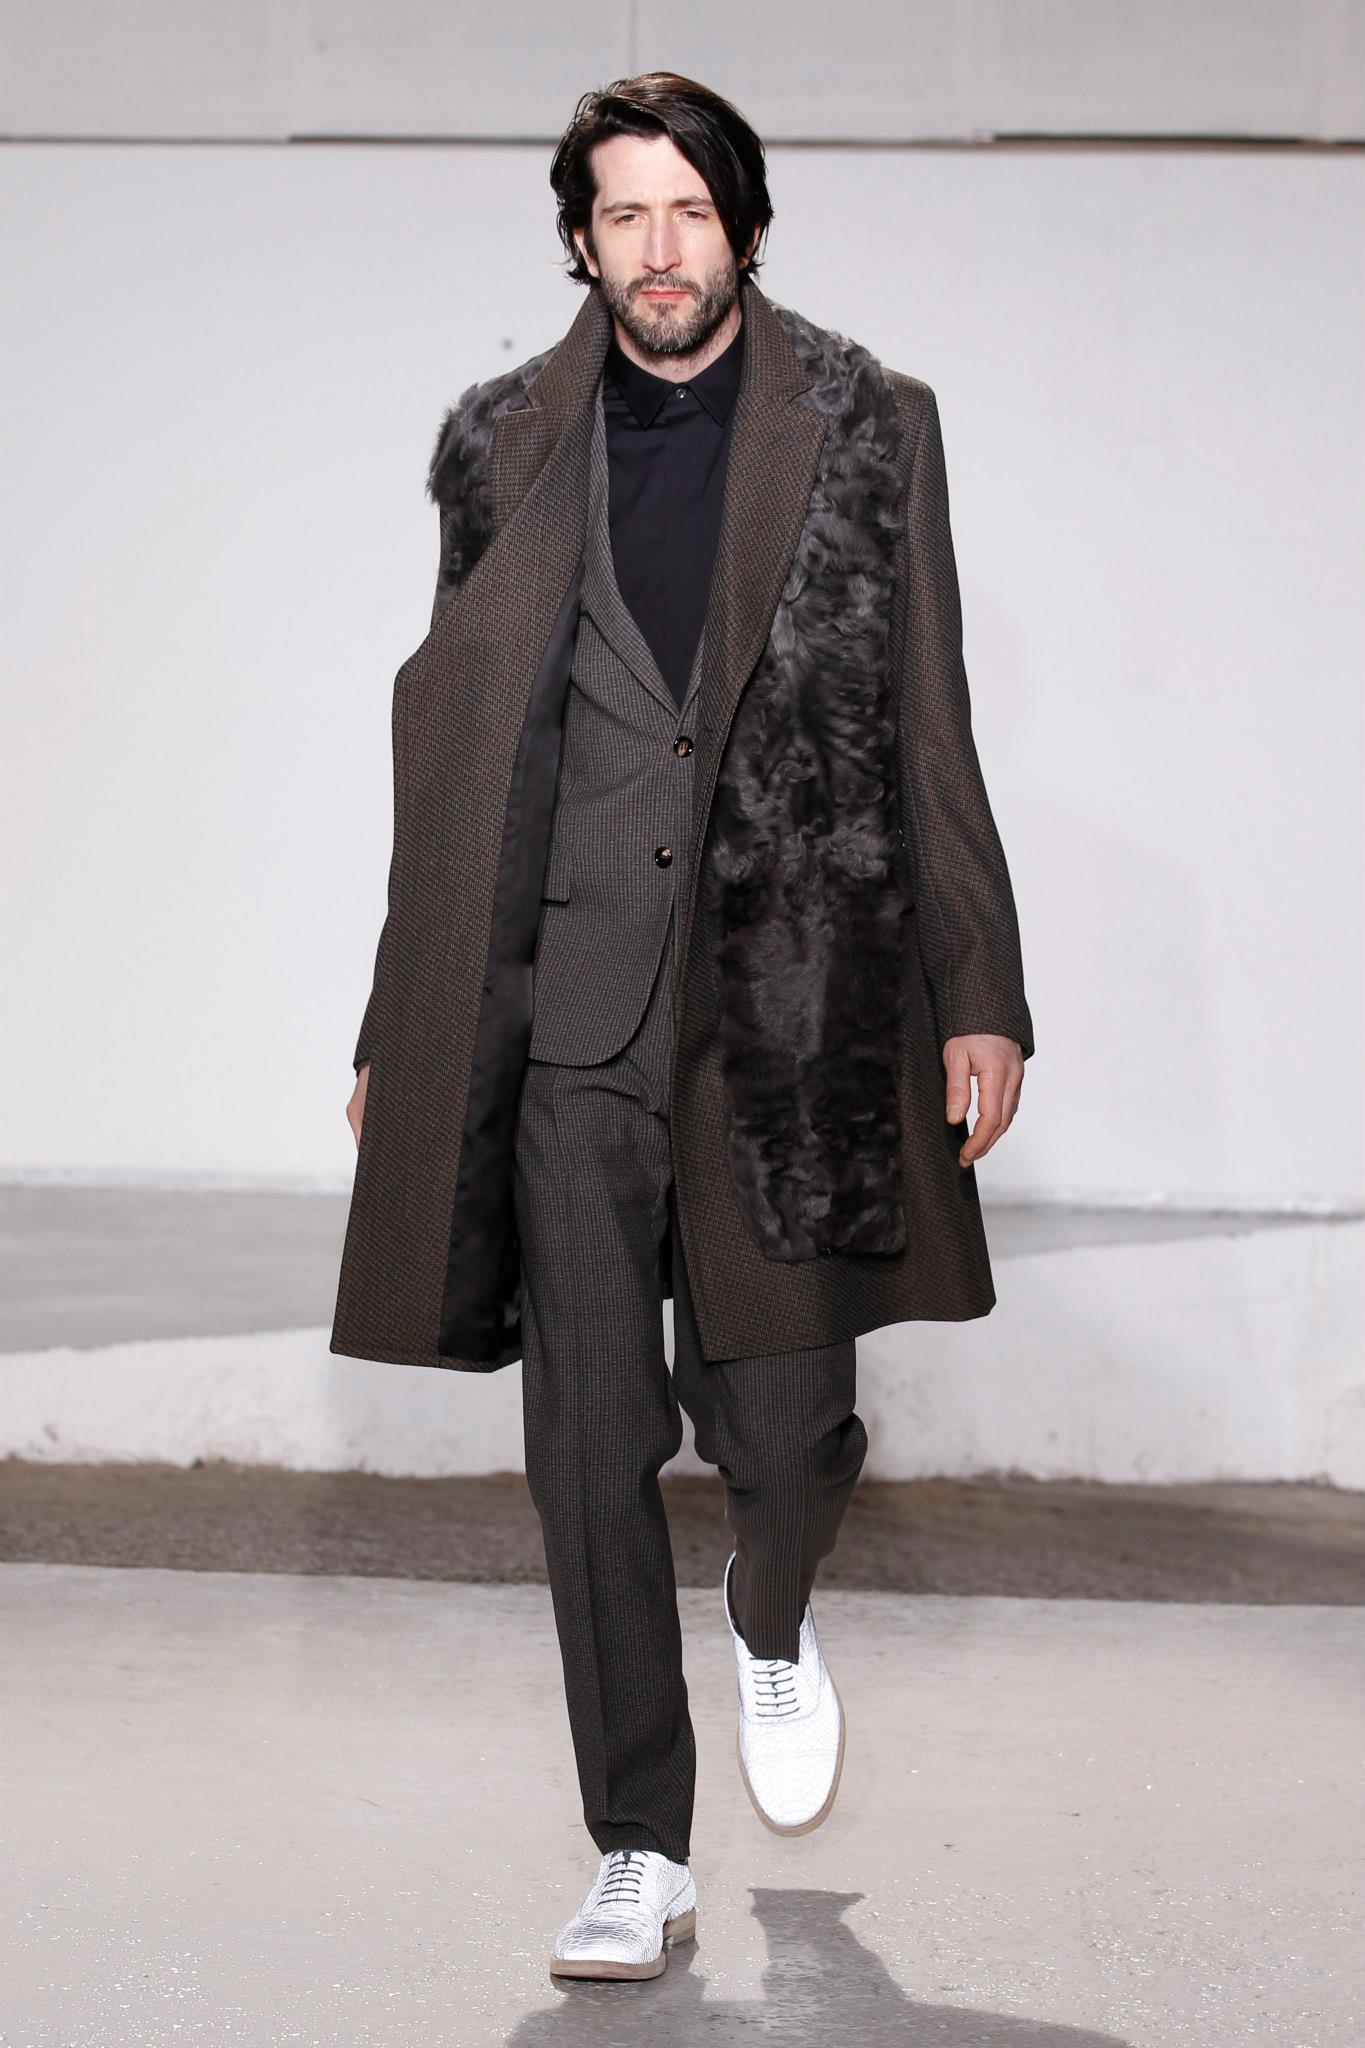 Maison Martin Margiela Fall Winter 2013.14 Menswear Collection